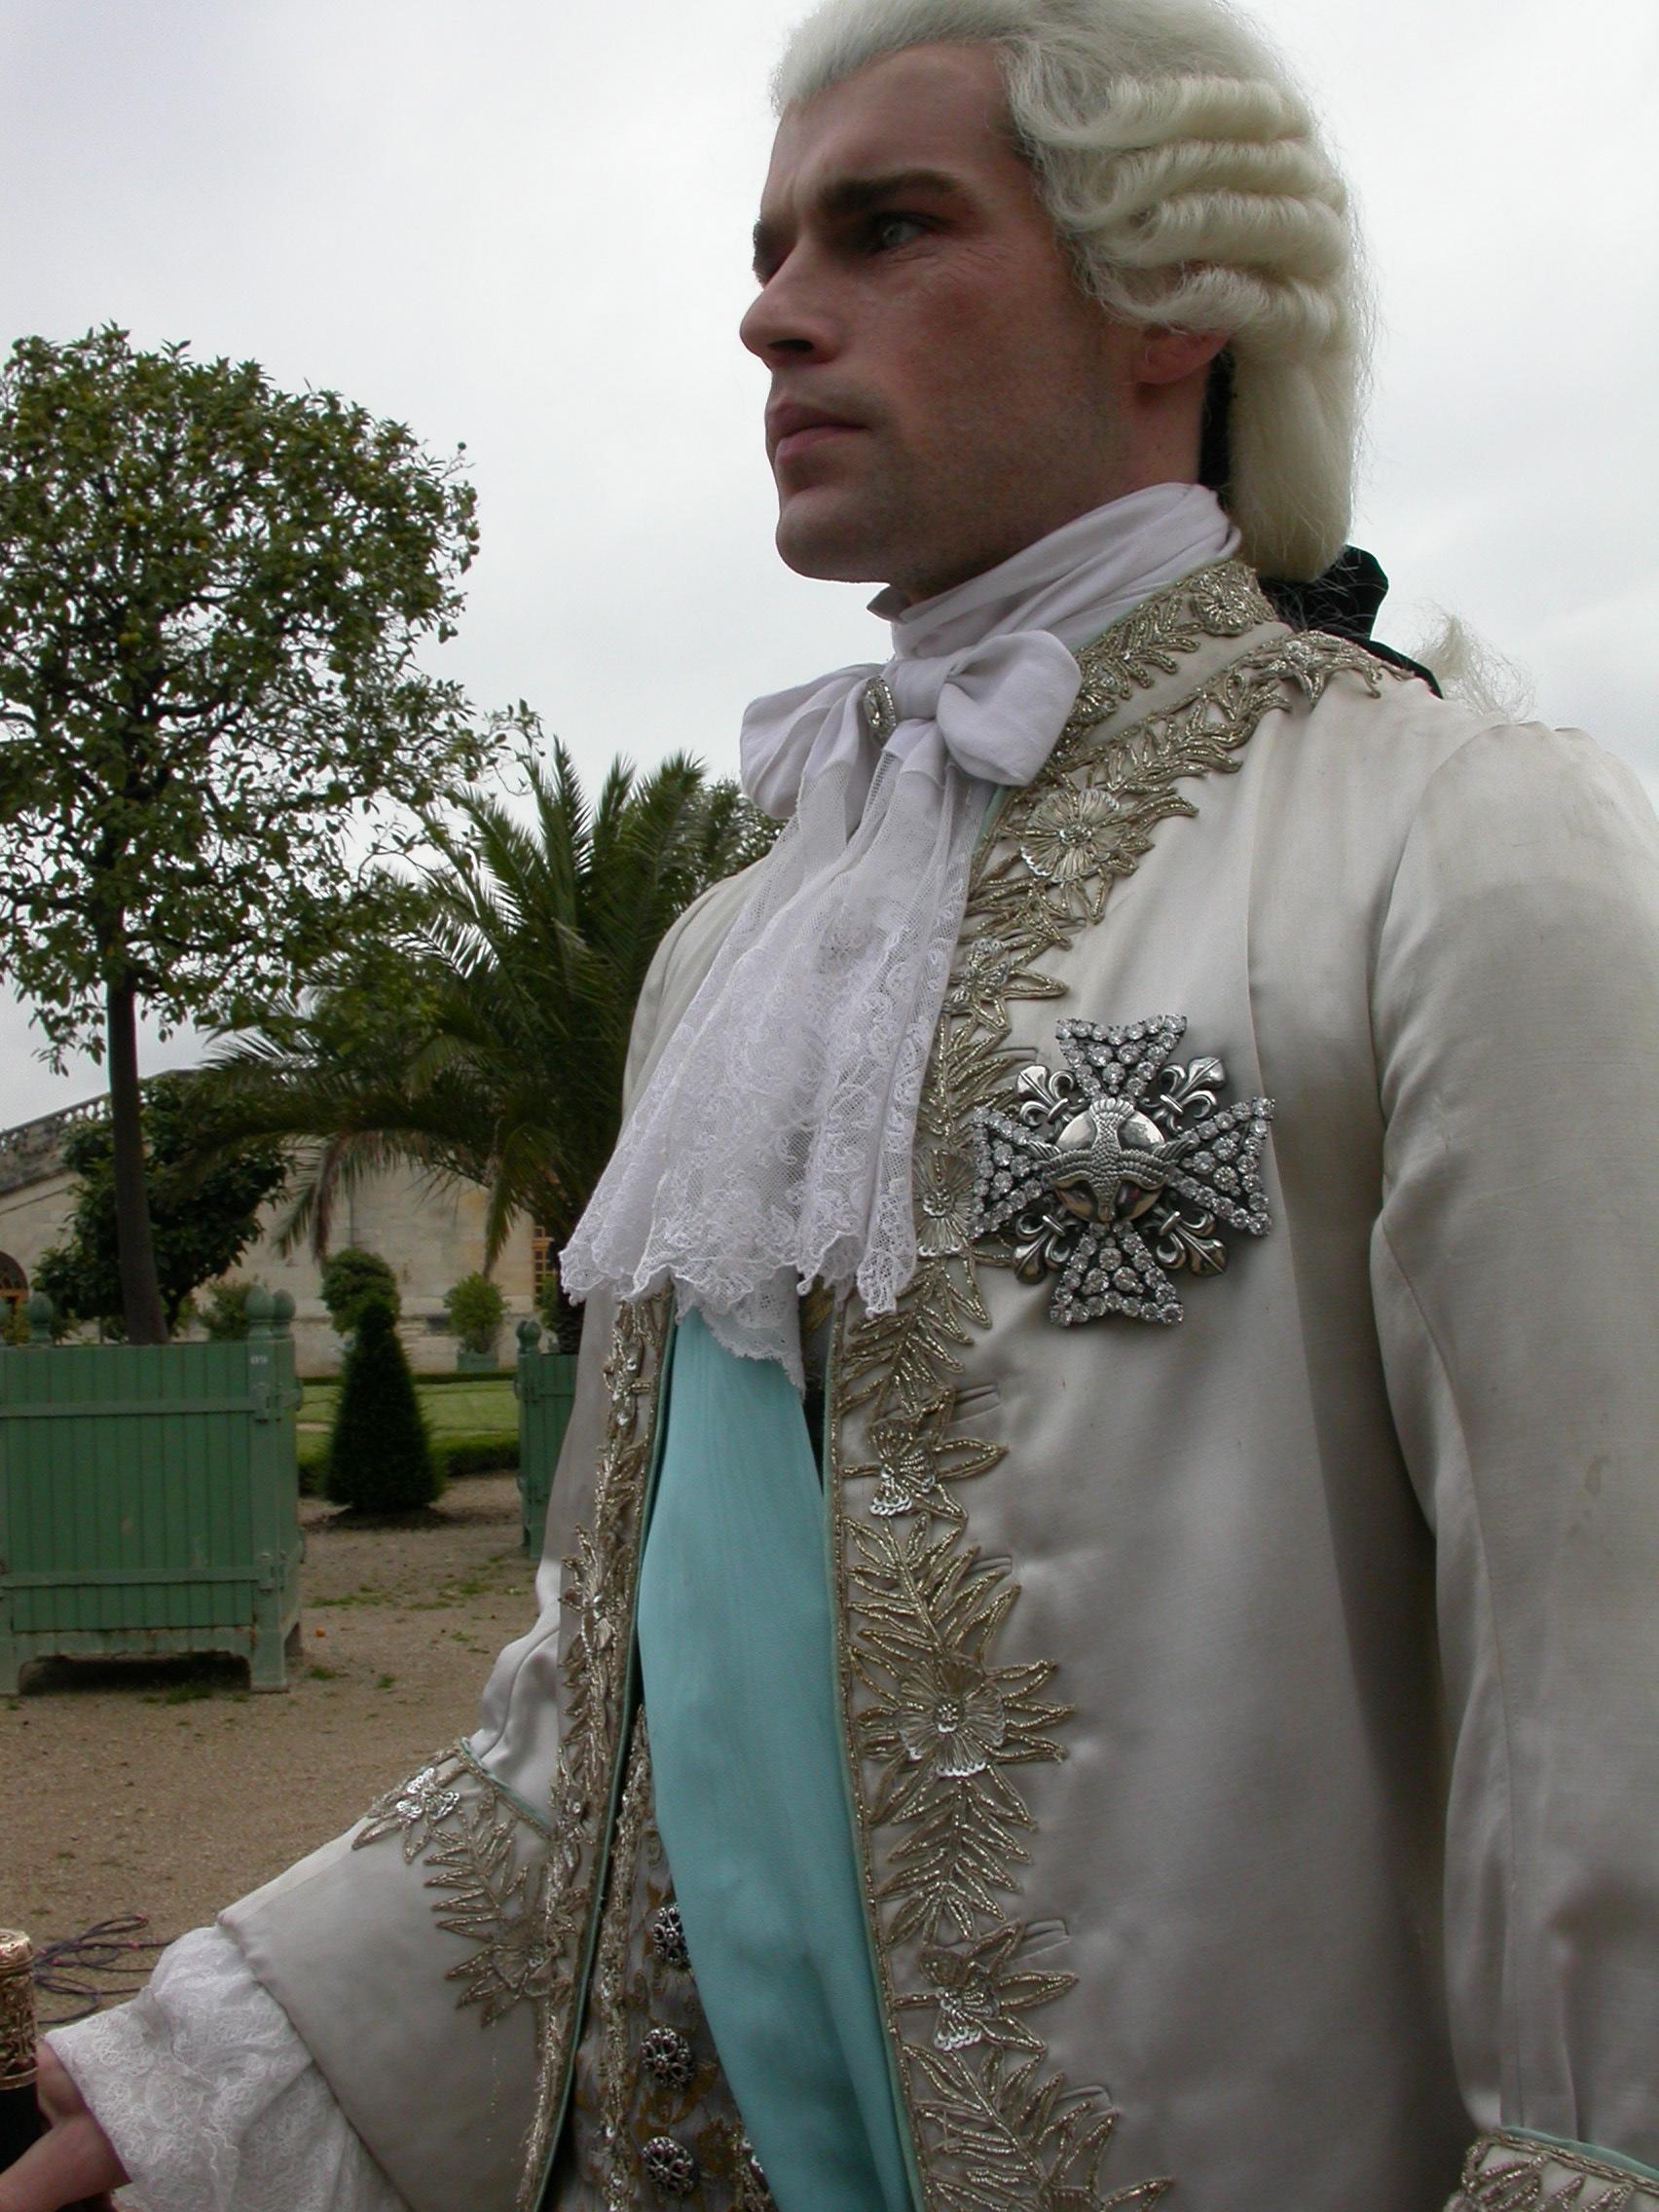 2009.LOUIS XV.LE SOLEIL NOIR.Thierry Binisti. (XVII°) (16)